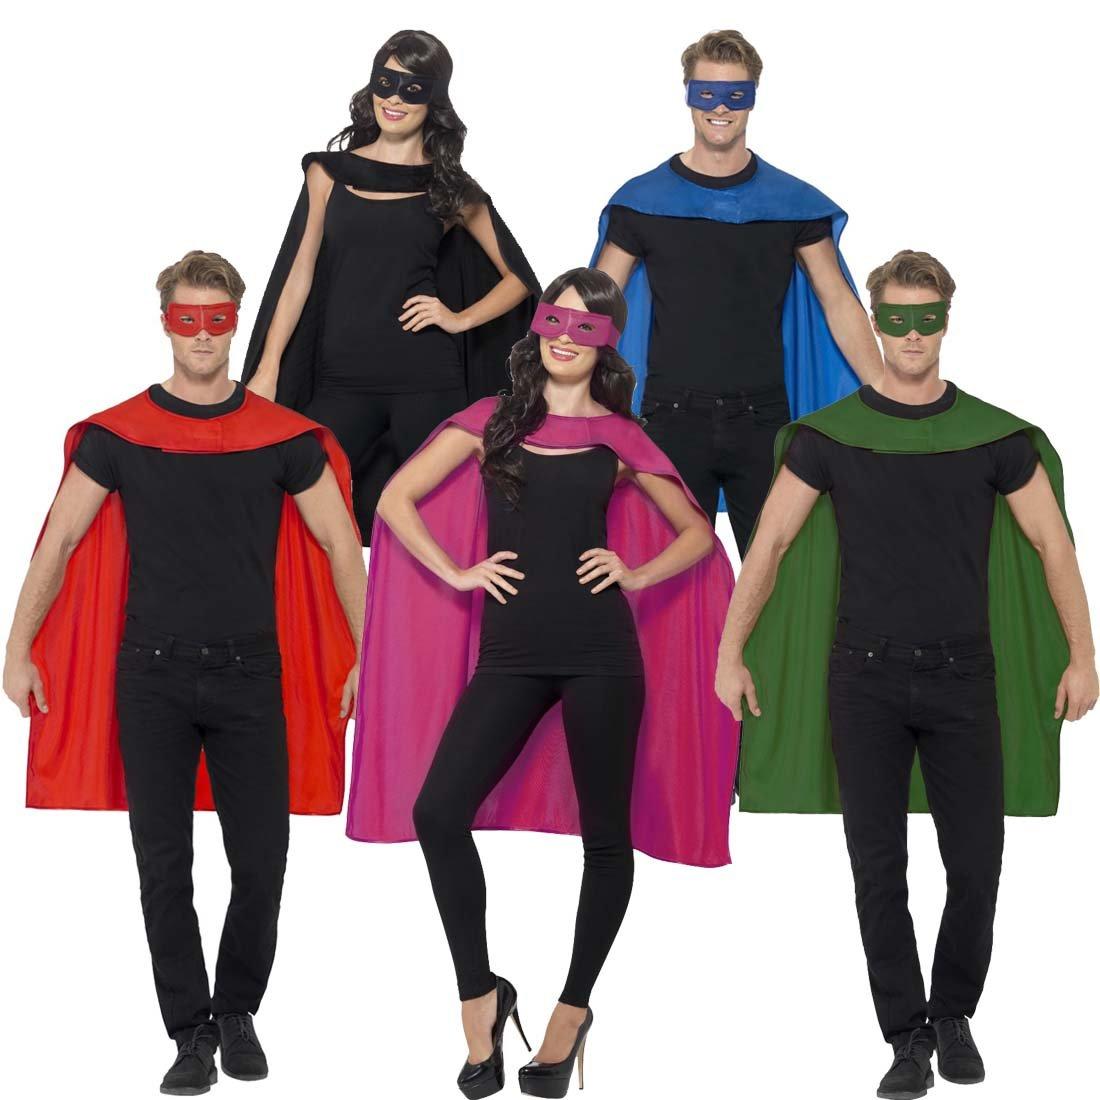 superheldenumhang maske superheld kostum blau superman umhang und augenmaske helden kostum erwachsene superhero karnevalskostum superhelden cape outfit